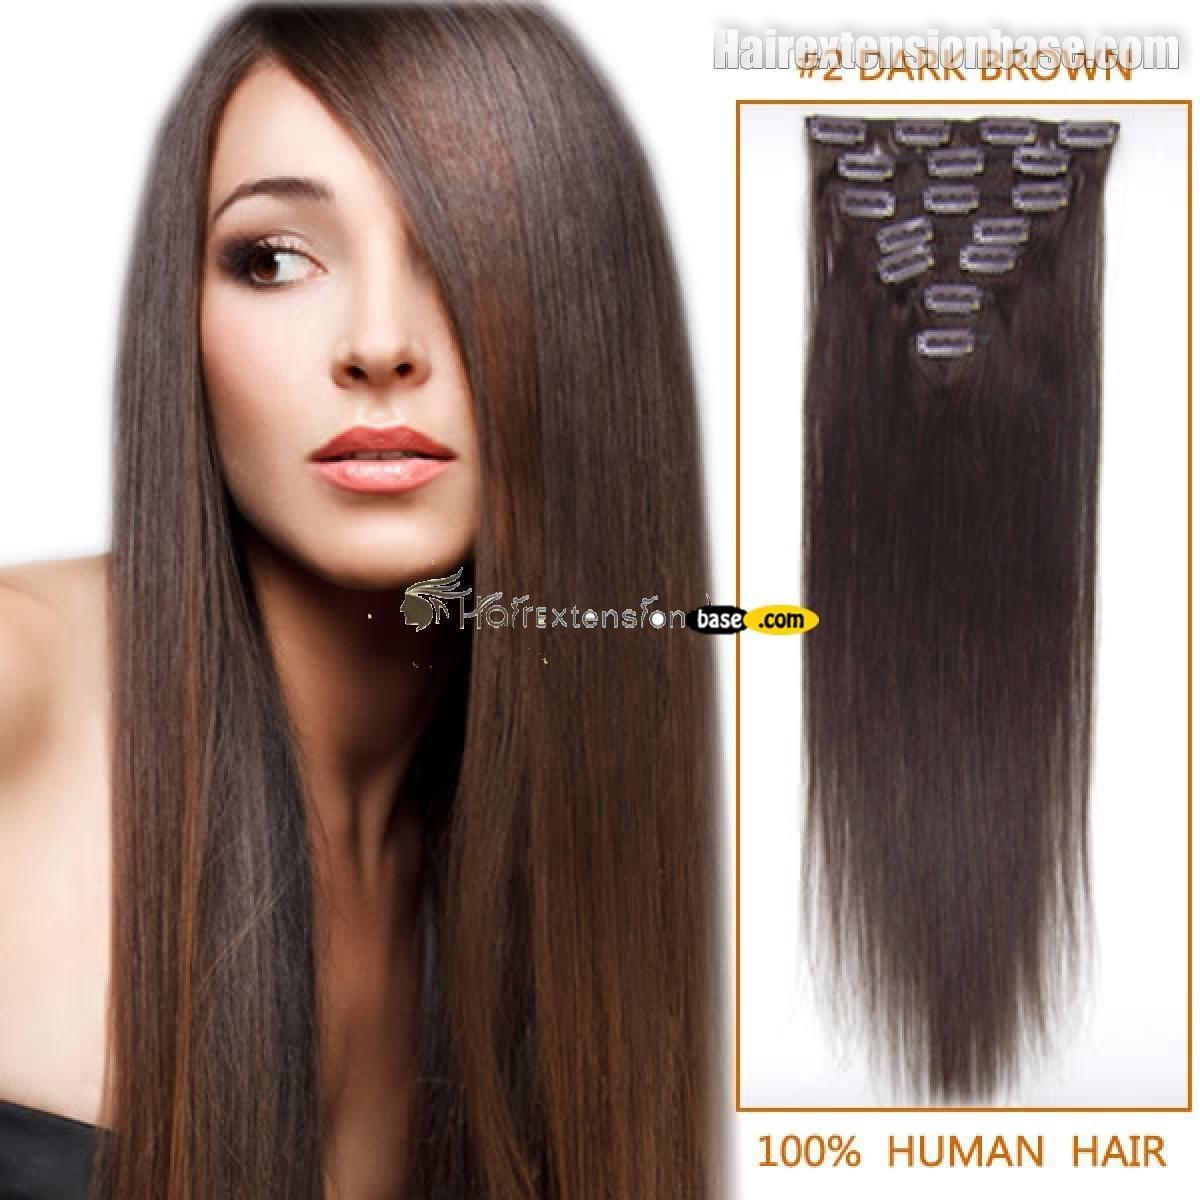 18 Inch Dark Brown Col 2 Full Head Clip In Human Hair Extensions